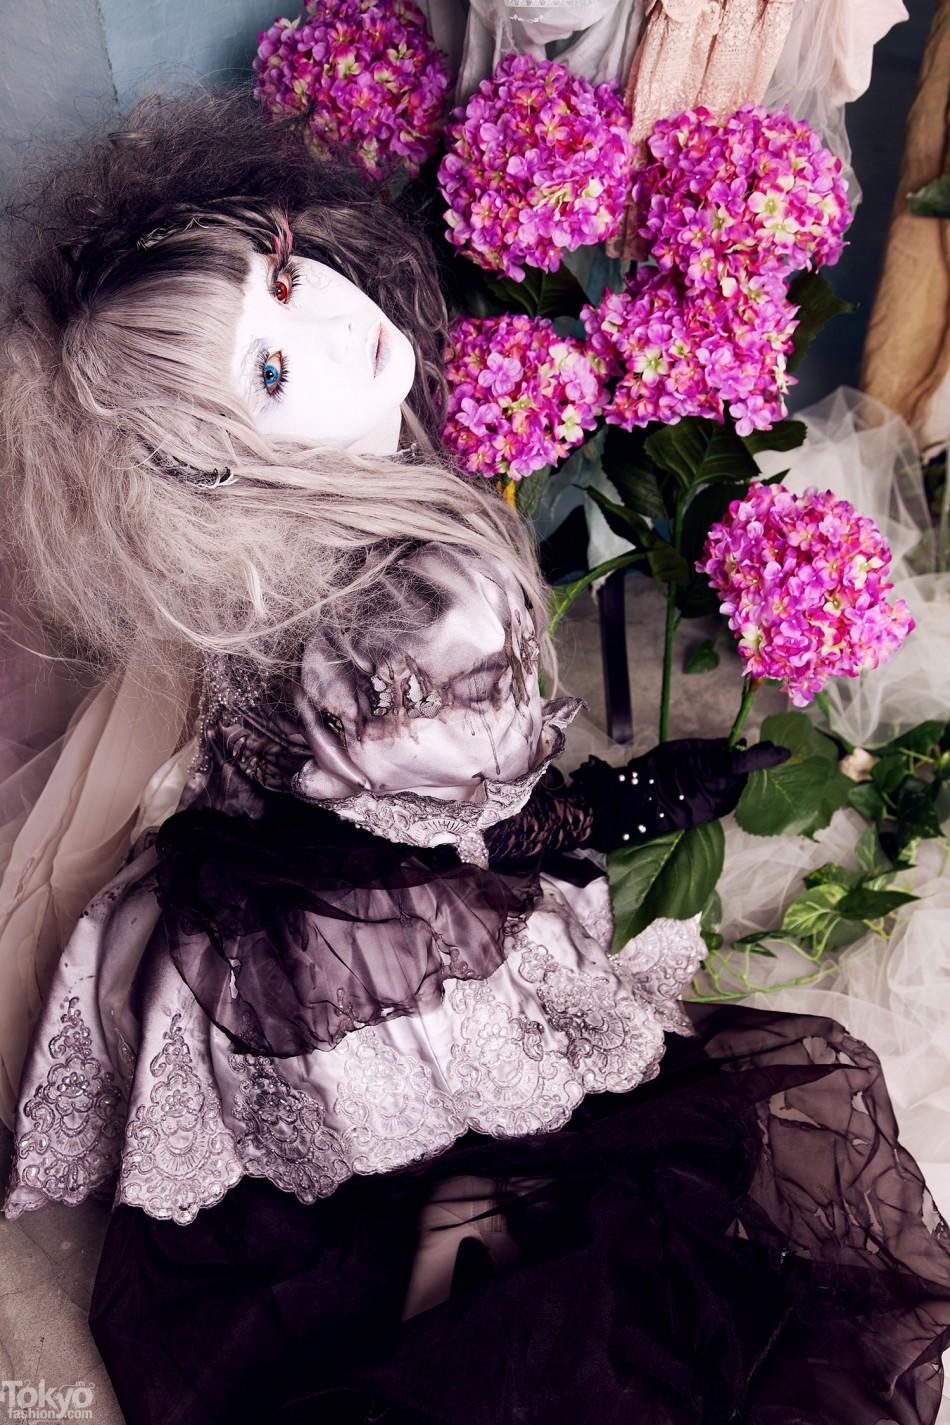 Minori - Her Memories of a Dream (6)